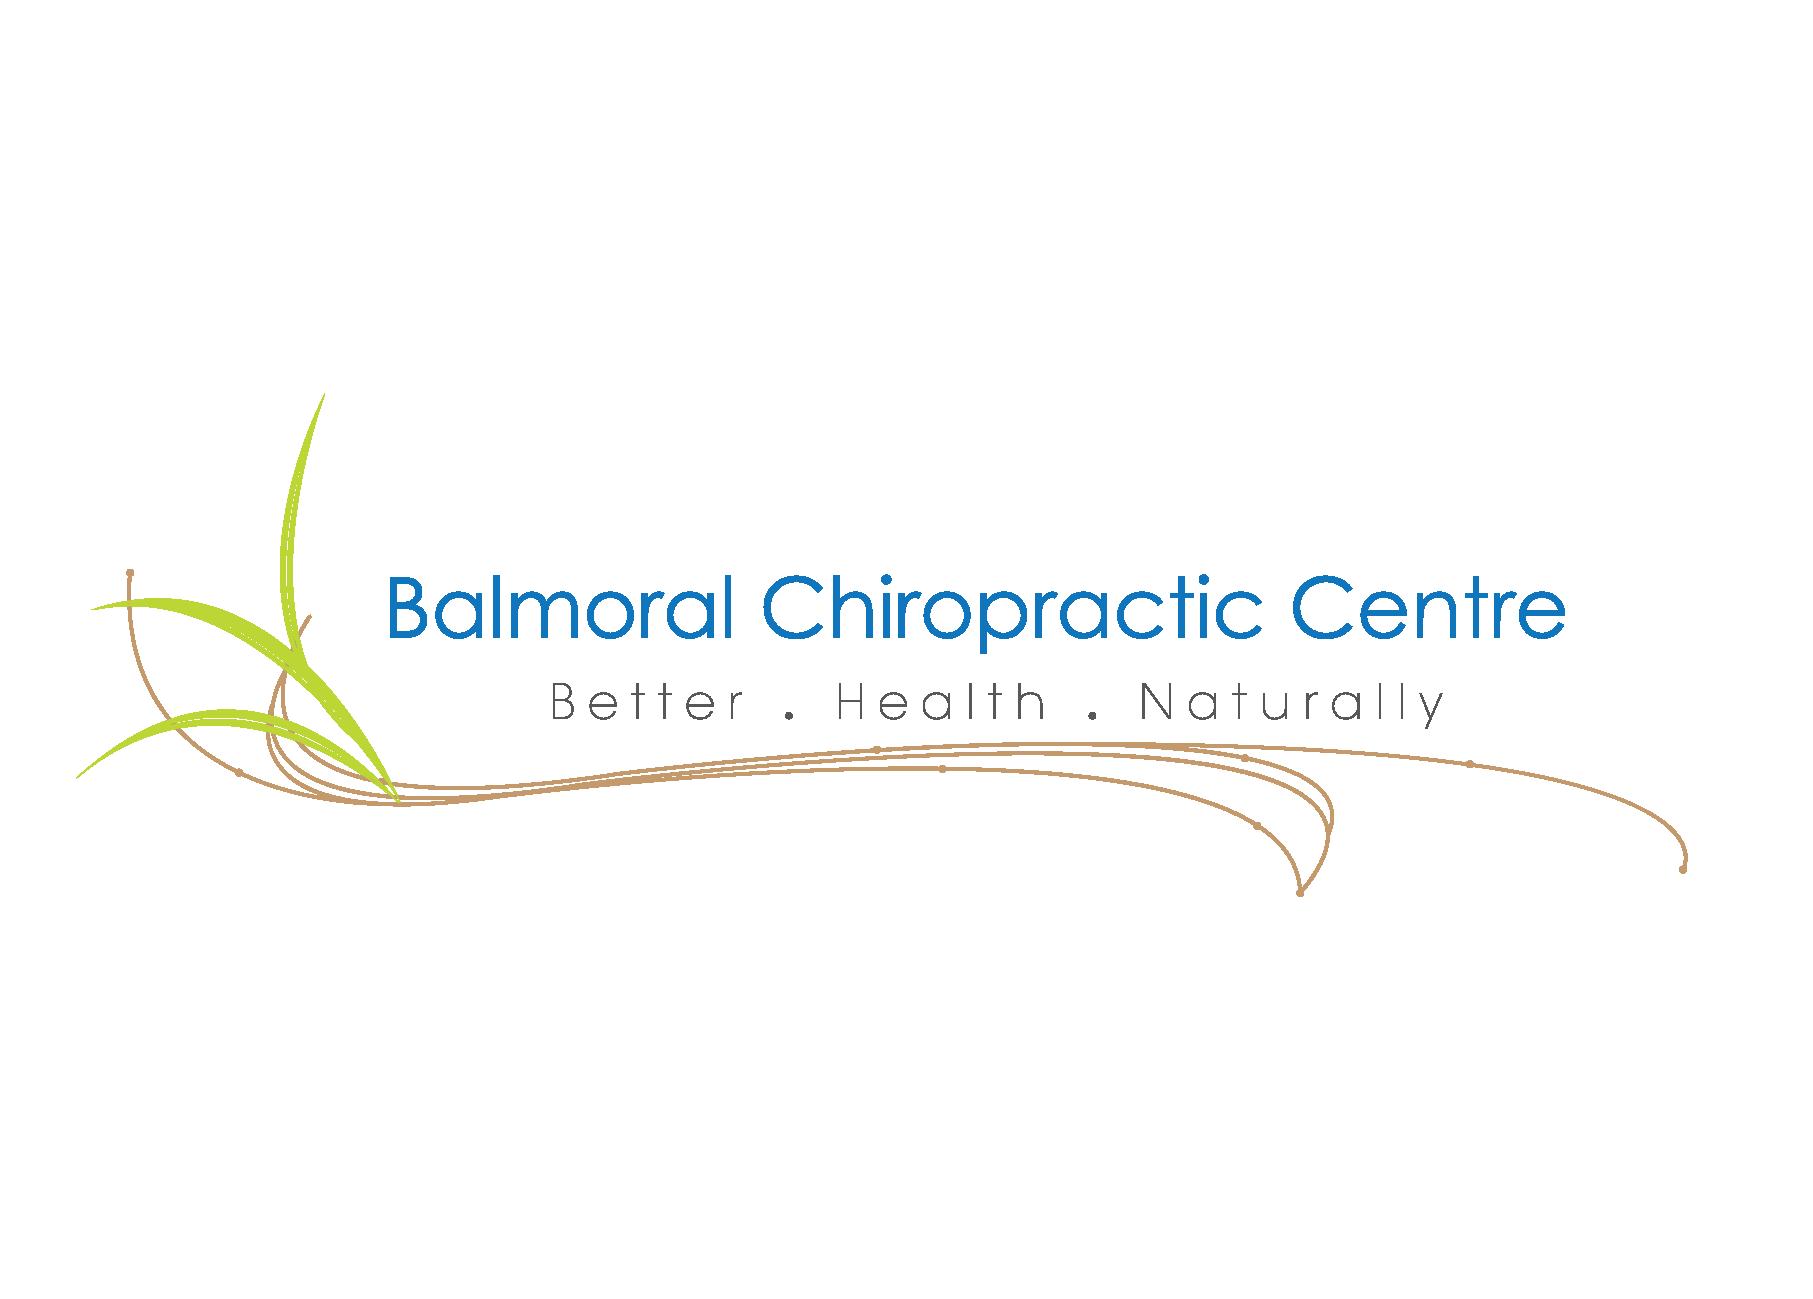 Balmoral Chiropactic